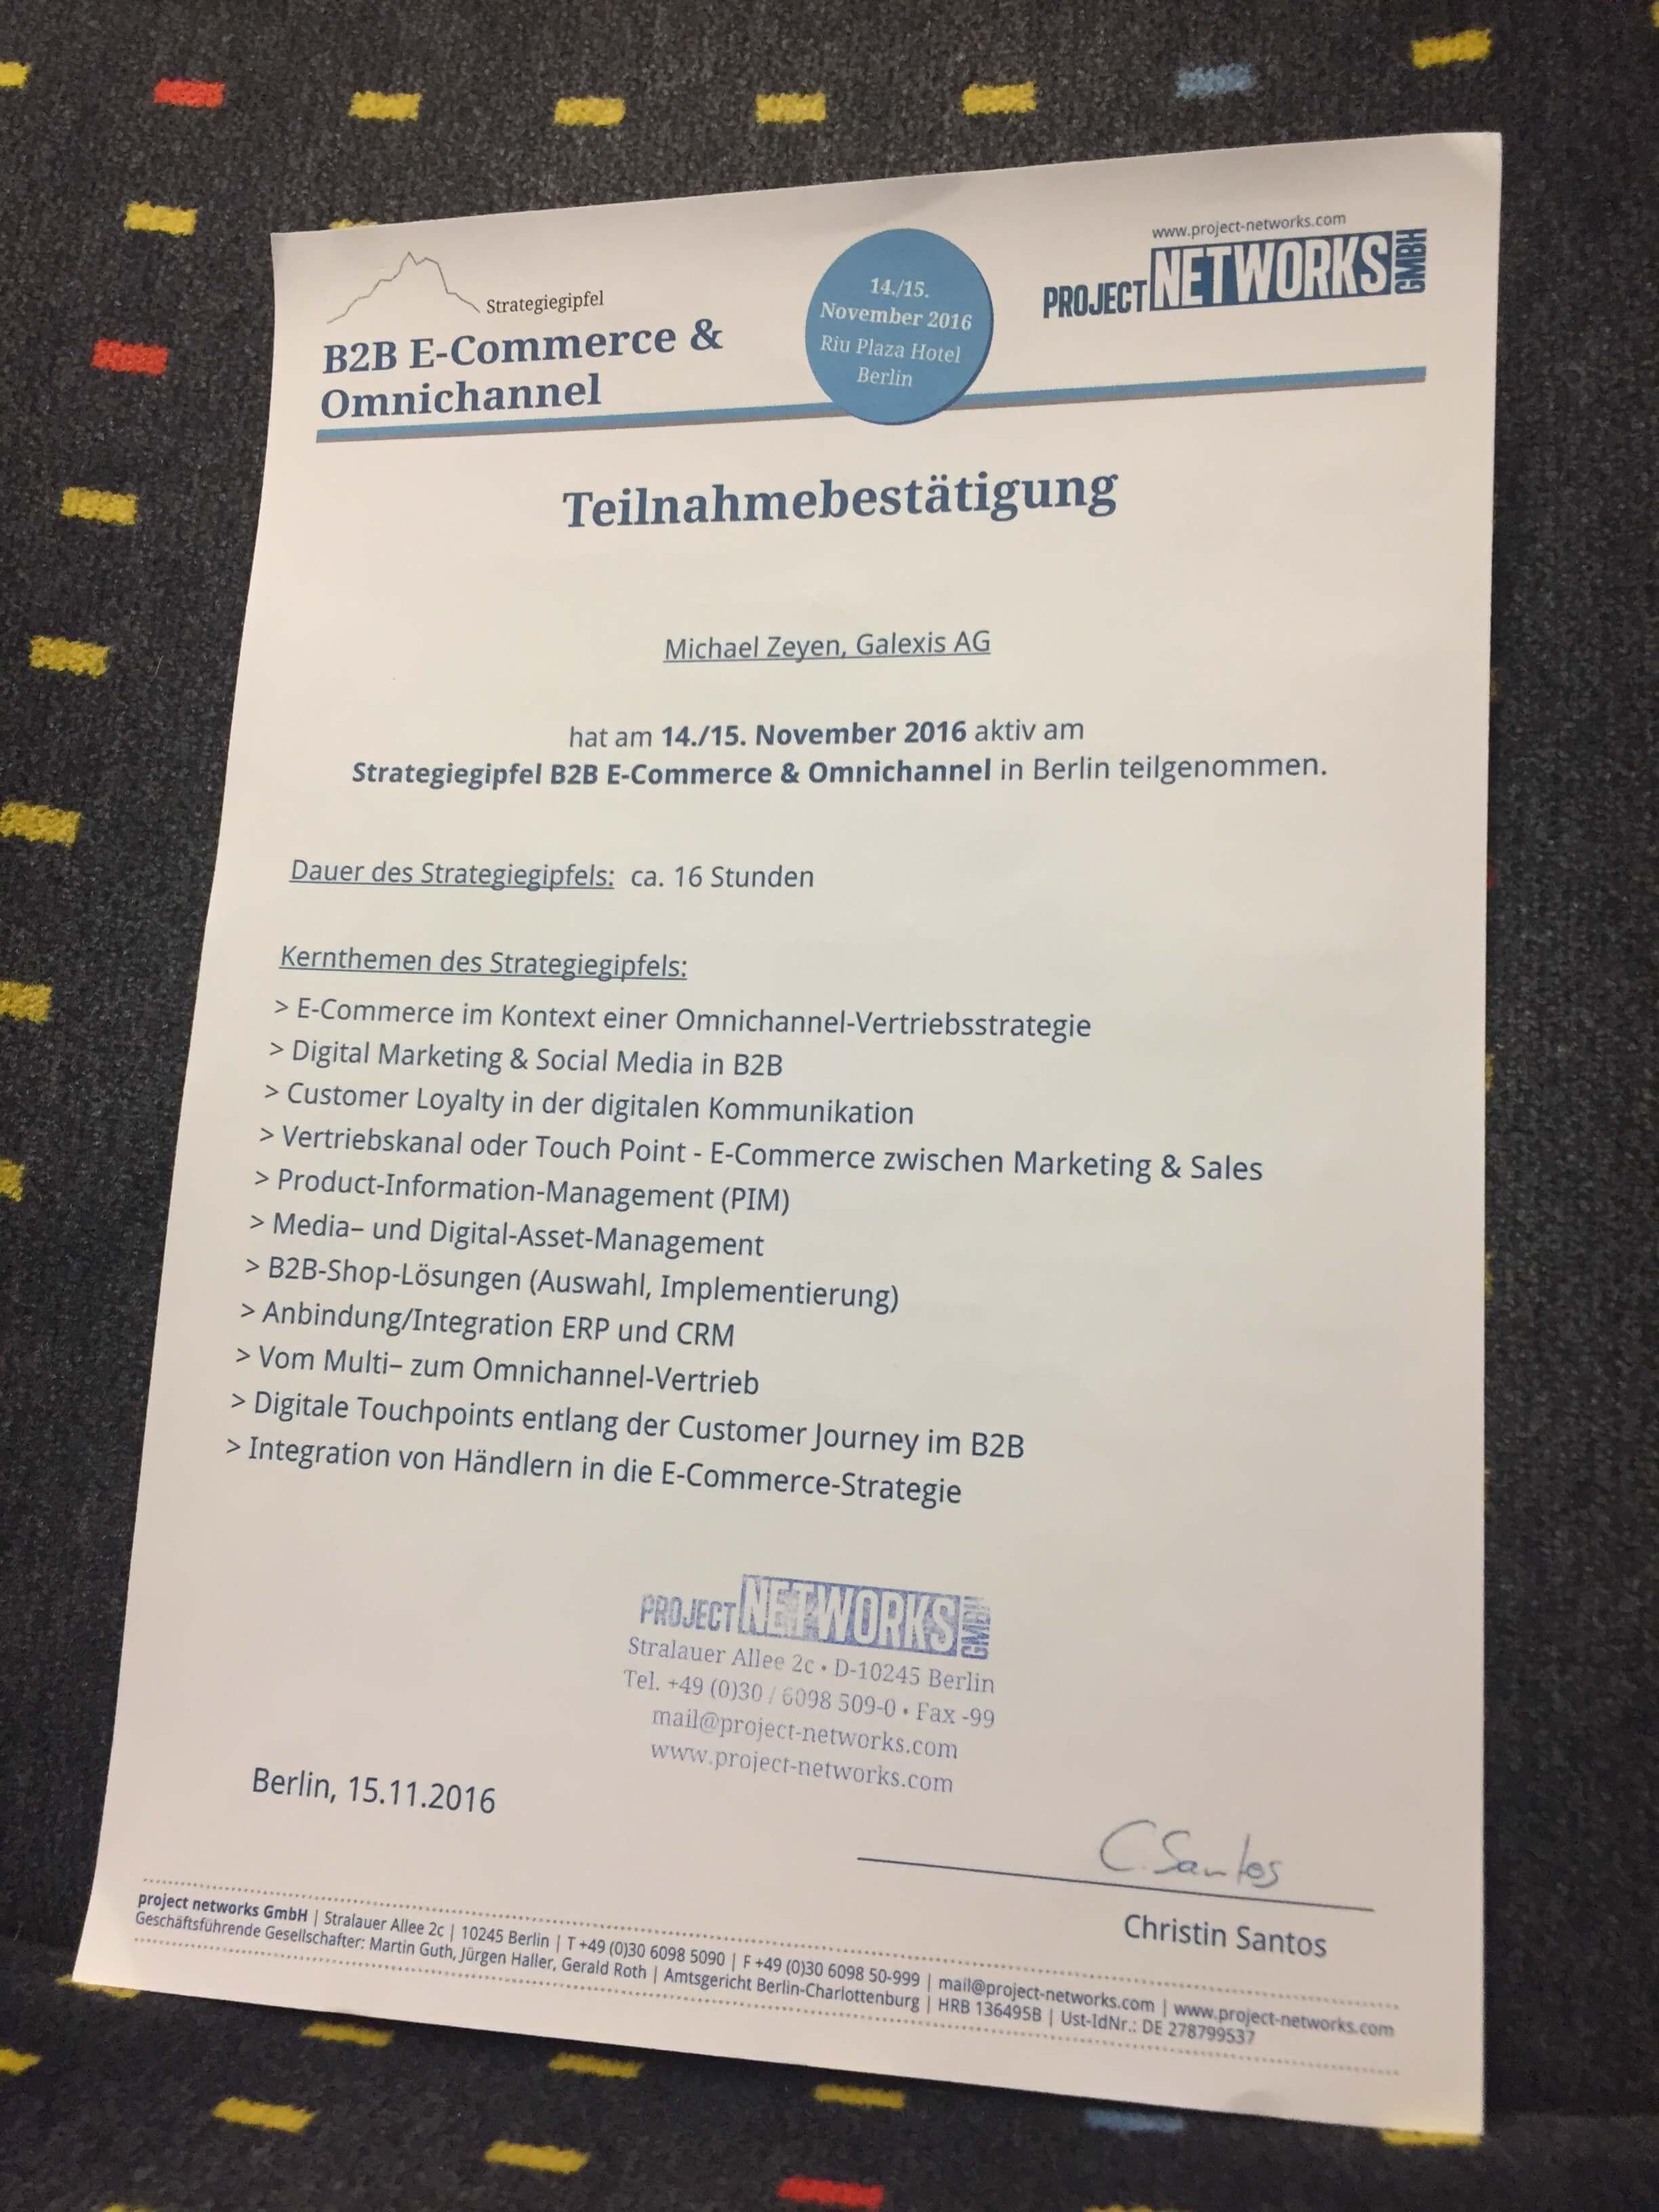 Teilnahmebestätigung Strategiegipfel B2B E-Commerce 2016